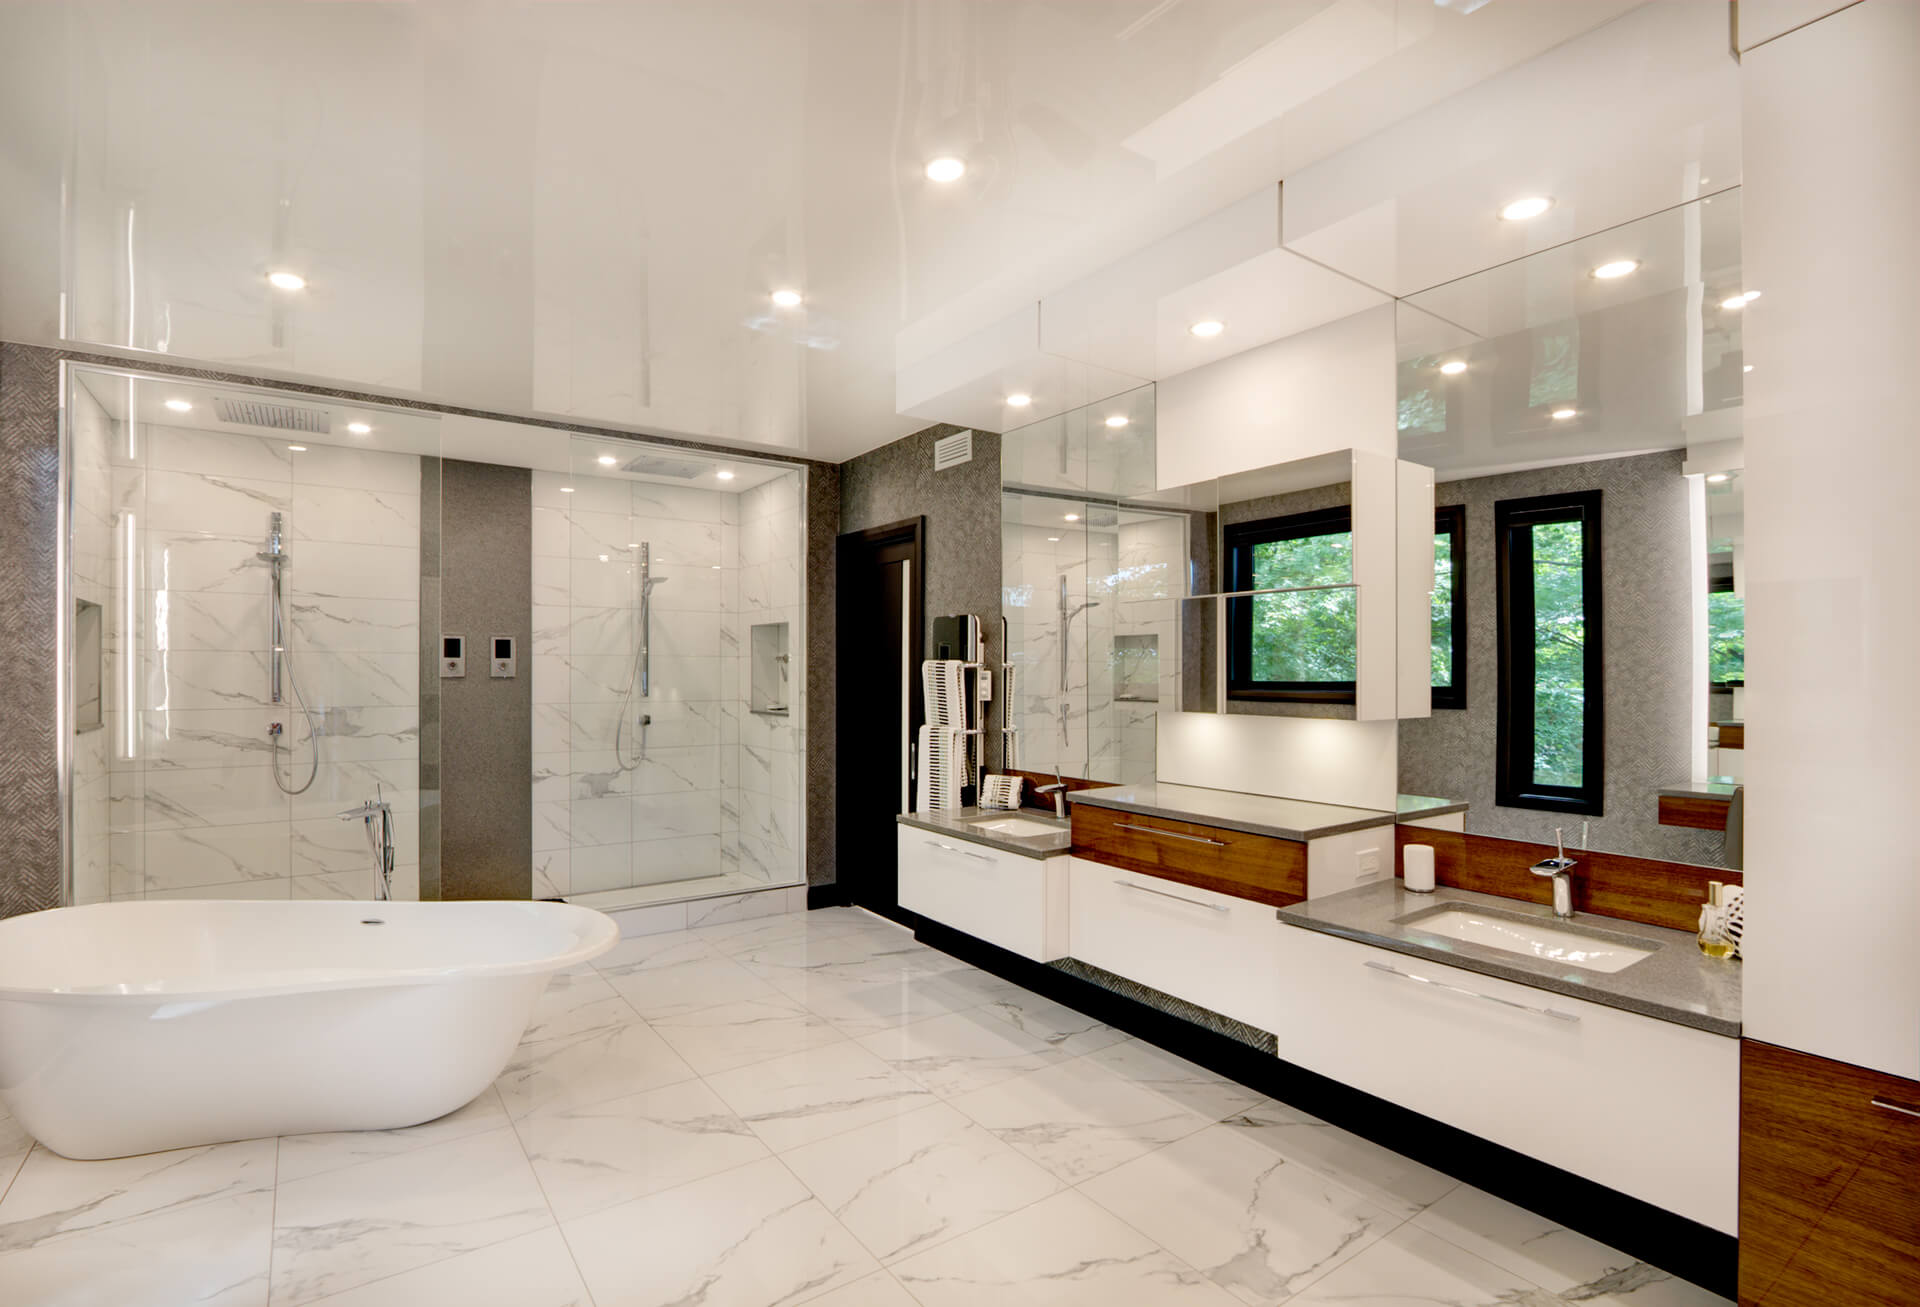 Salle de bain moderne - Christian Marcoux